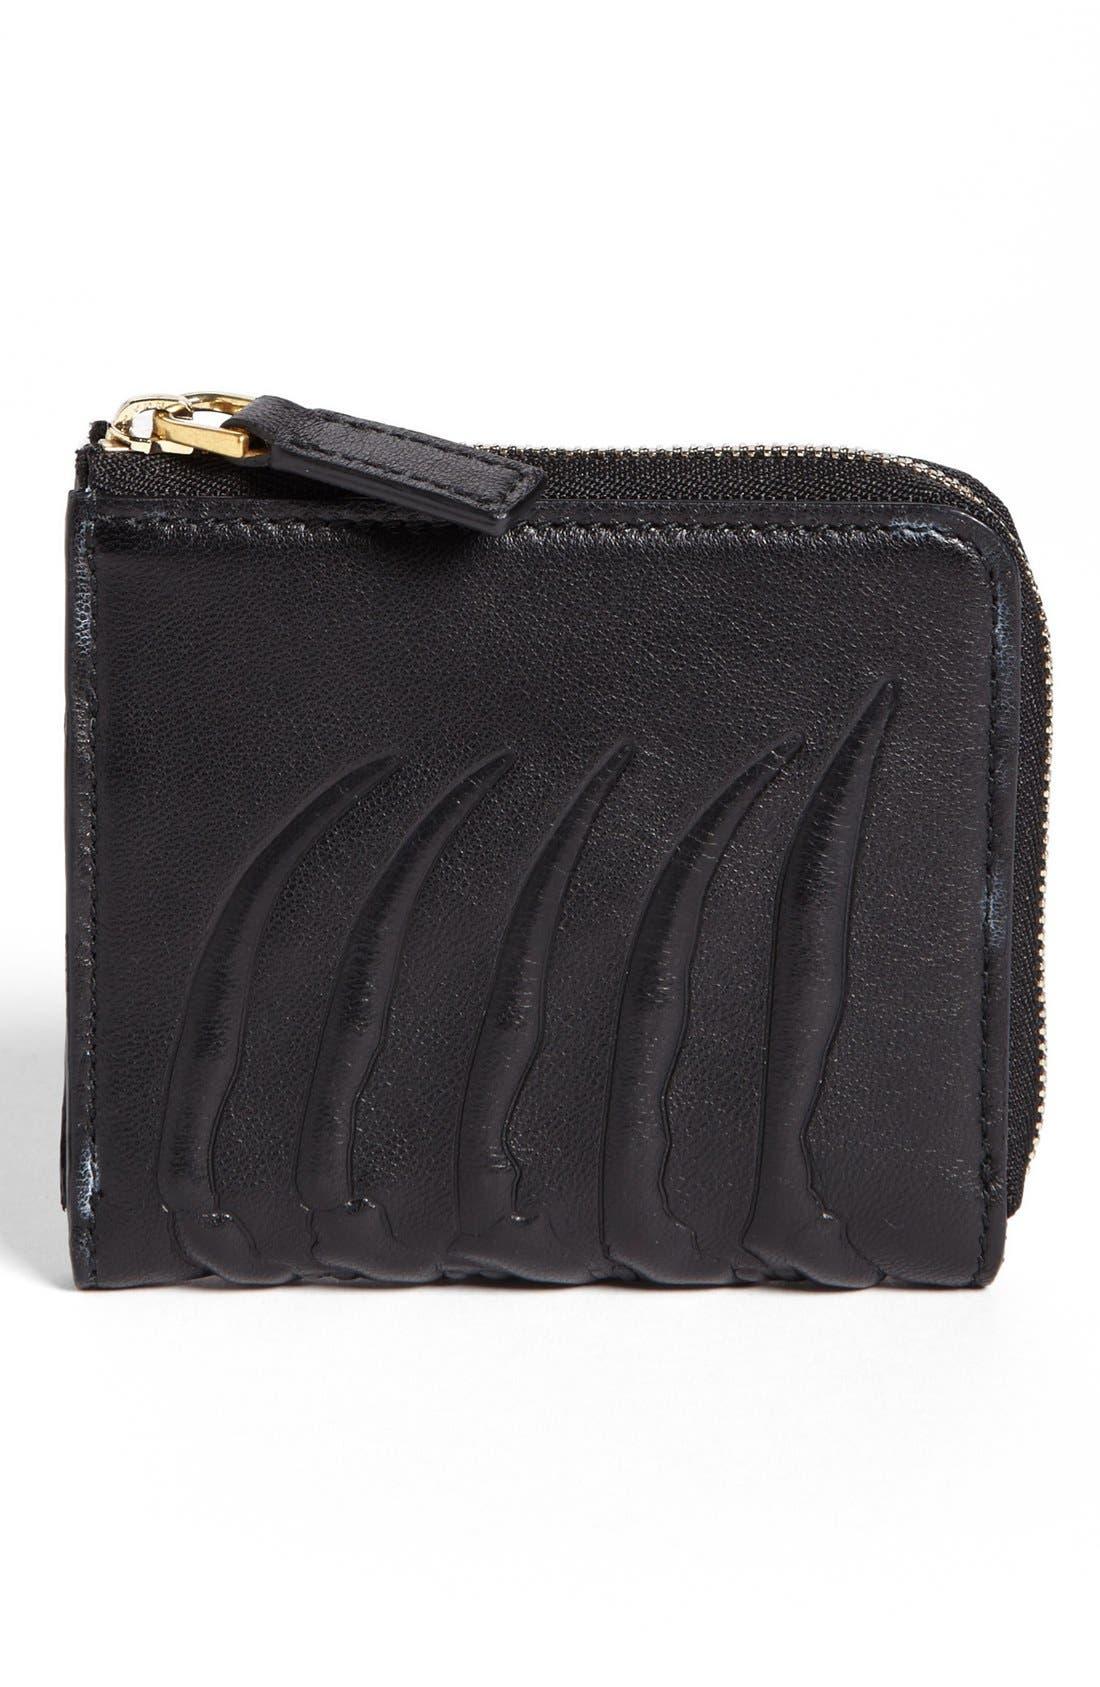 Alternate Image 1 Selected - Alexander McQueen Rib Cage Leather Half Zip Wallet